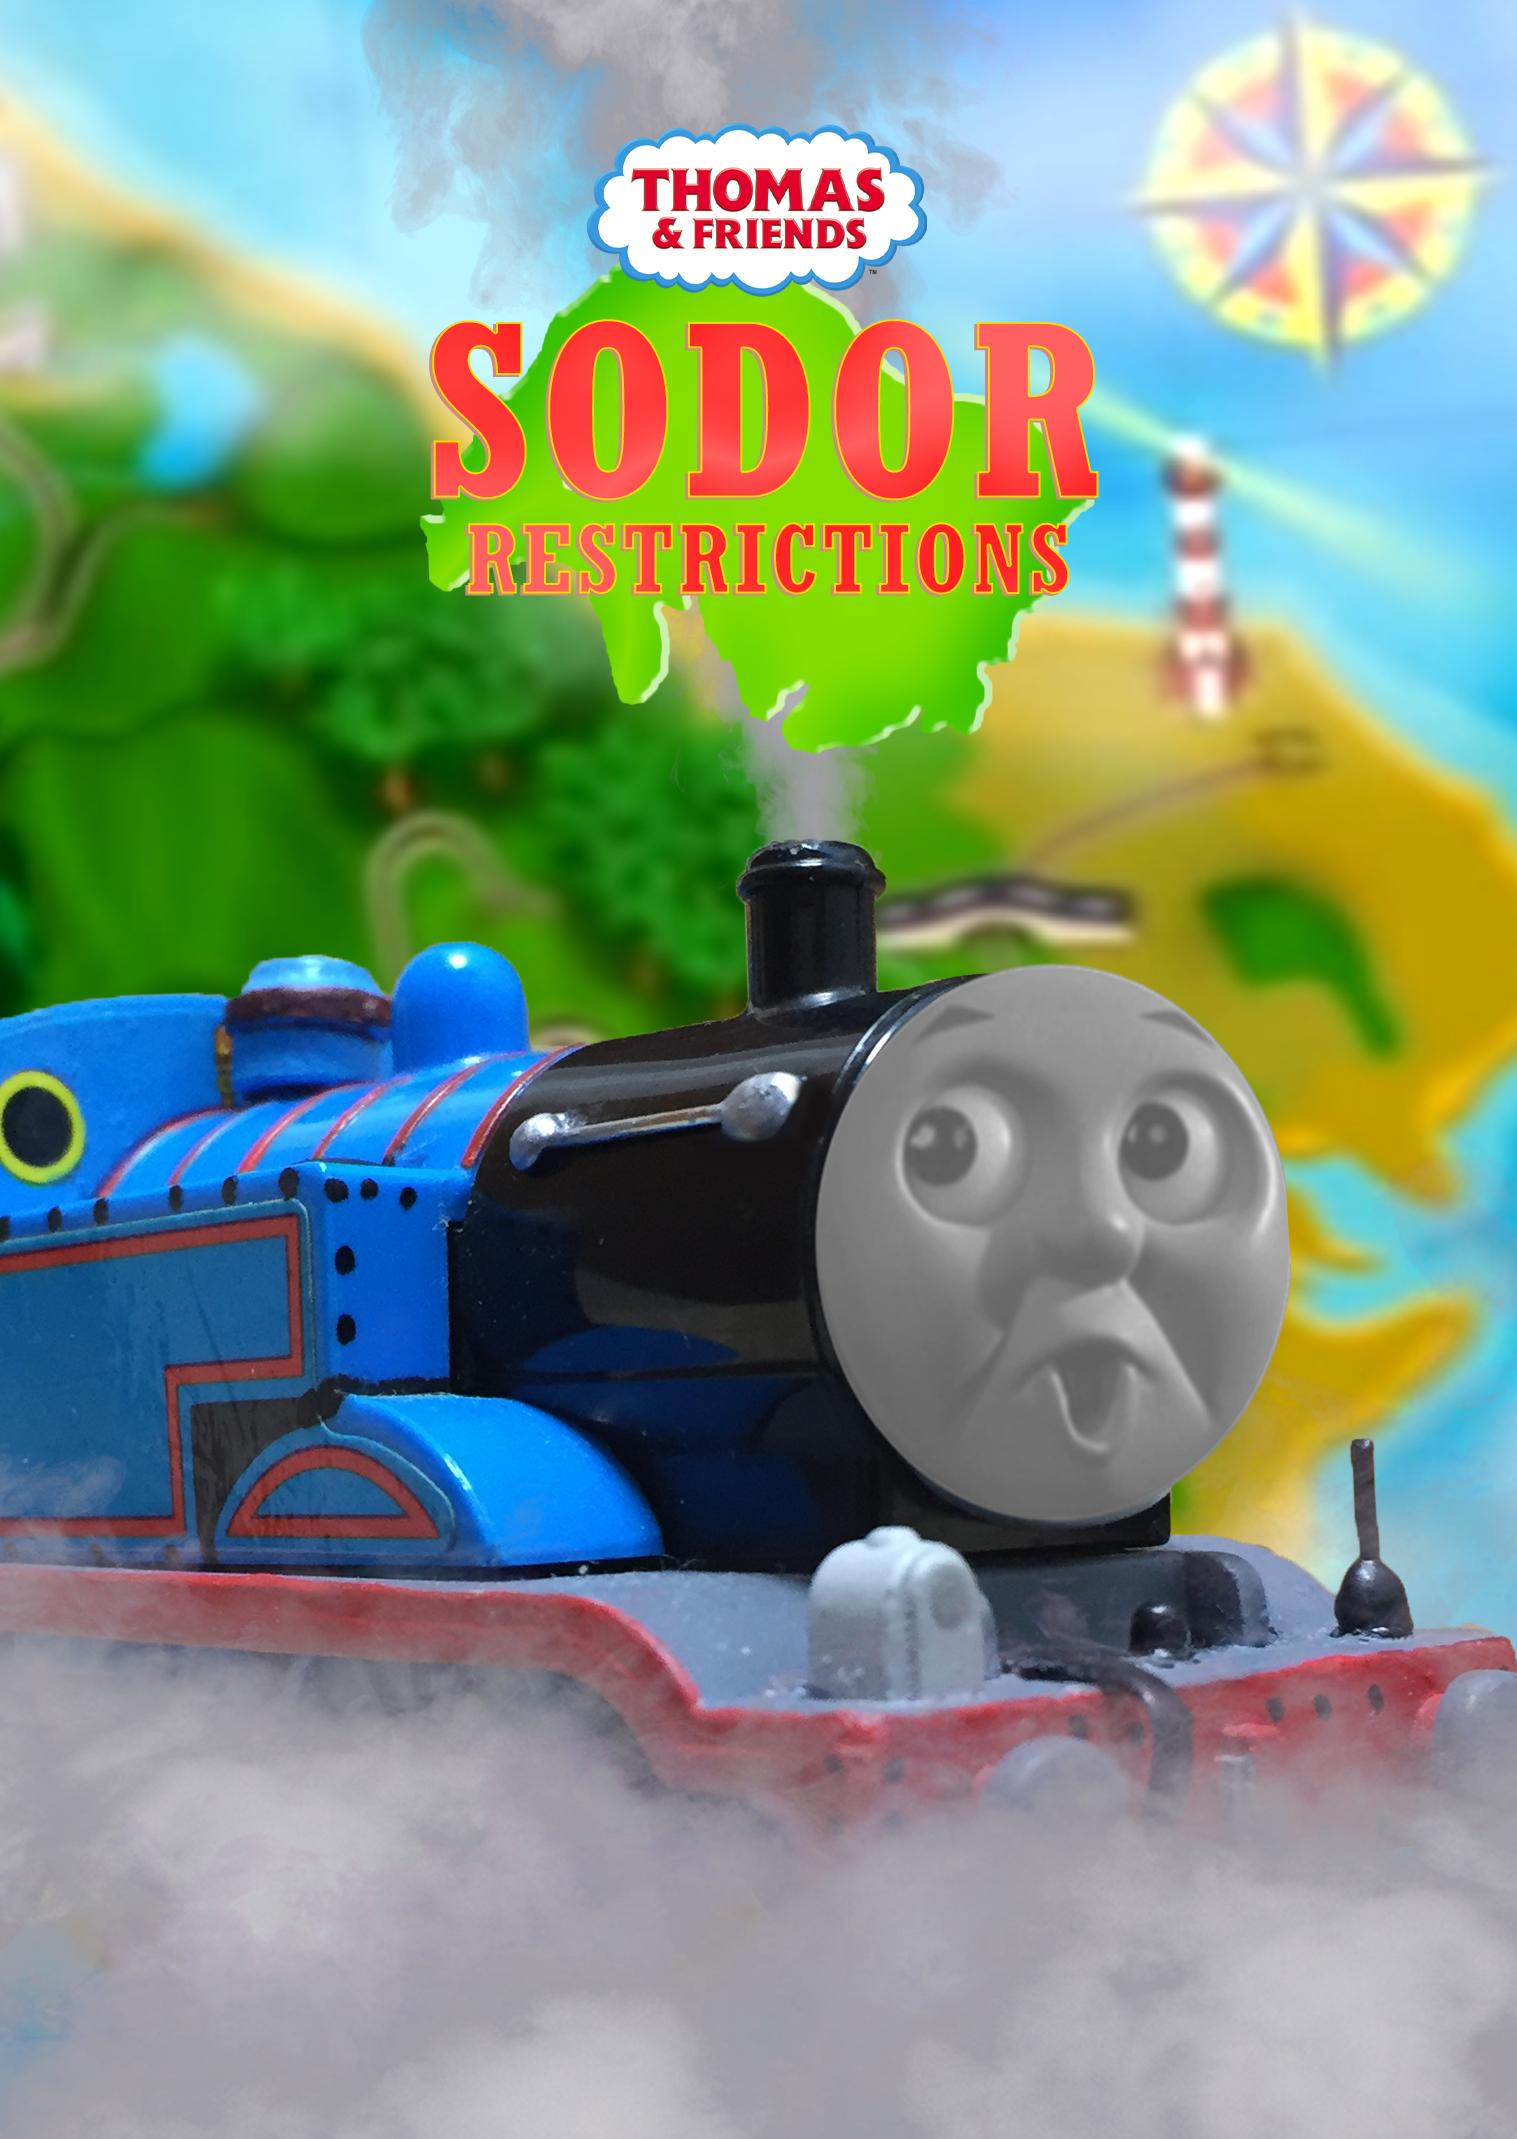 Thomas & Friends: Sodor Restrictions